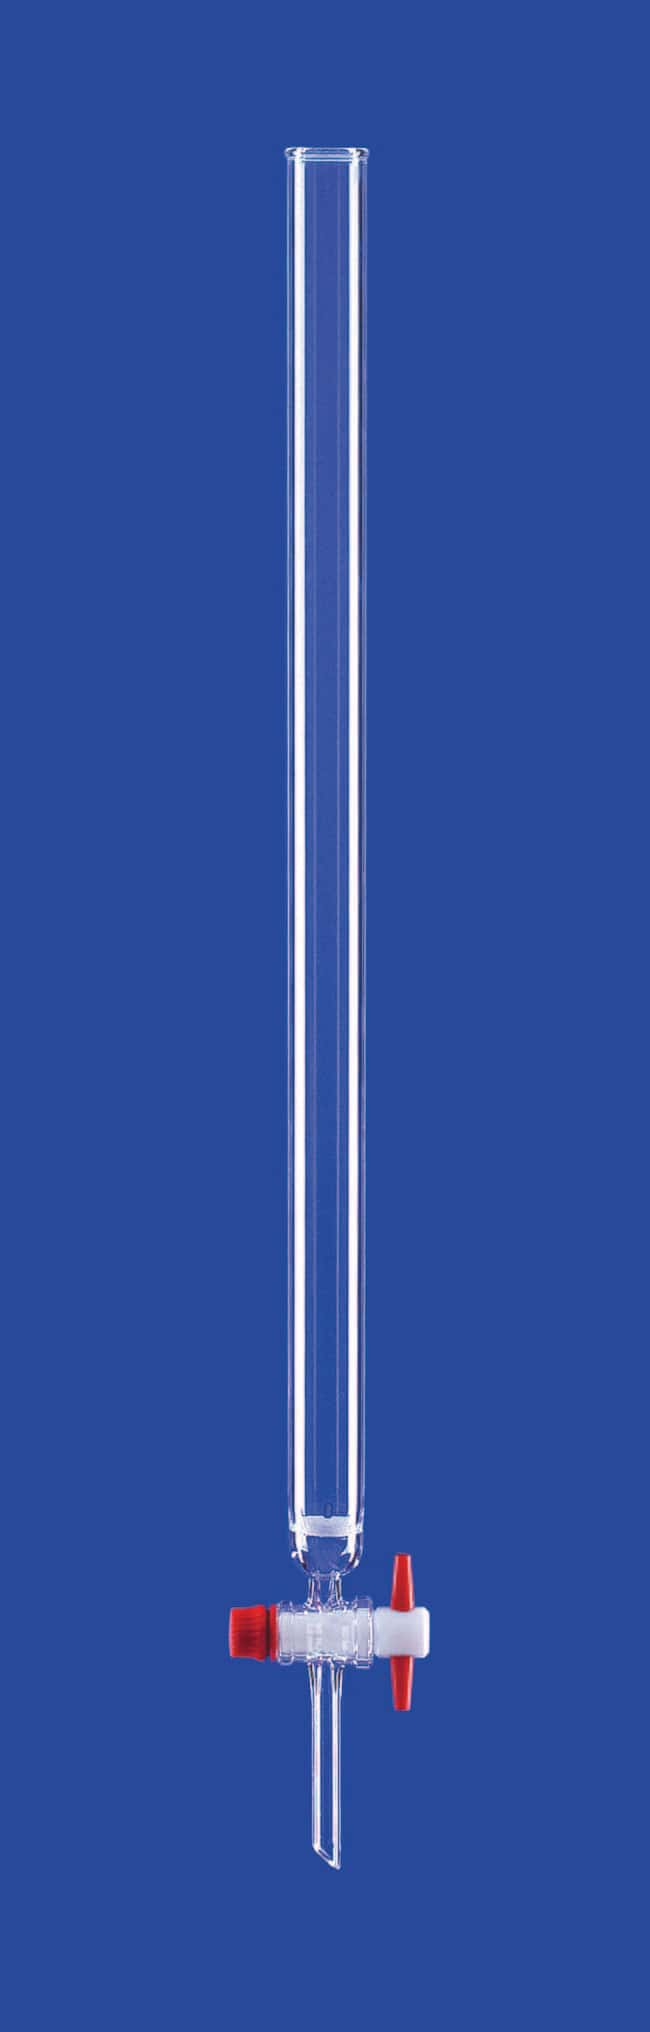 Lenz Laborglasinstrumente™Chromatographic Columns with Frit and Beaded Rim Column Capacity: 15mL Lenz Laborglasinstrumente™Chromatographic Columns with Frit and Beaded Rim